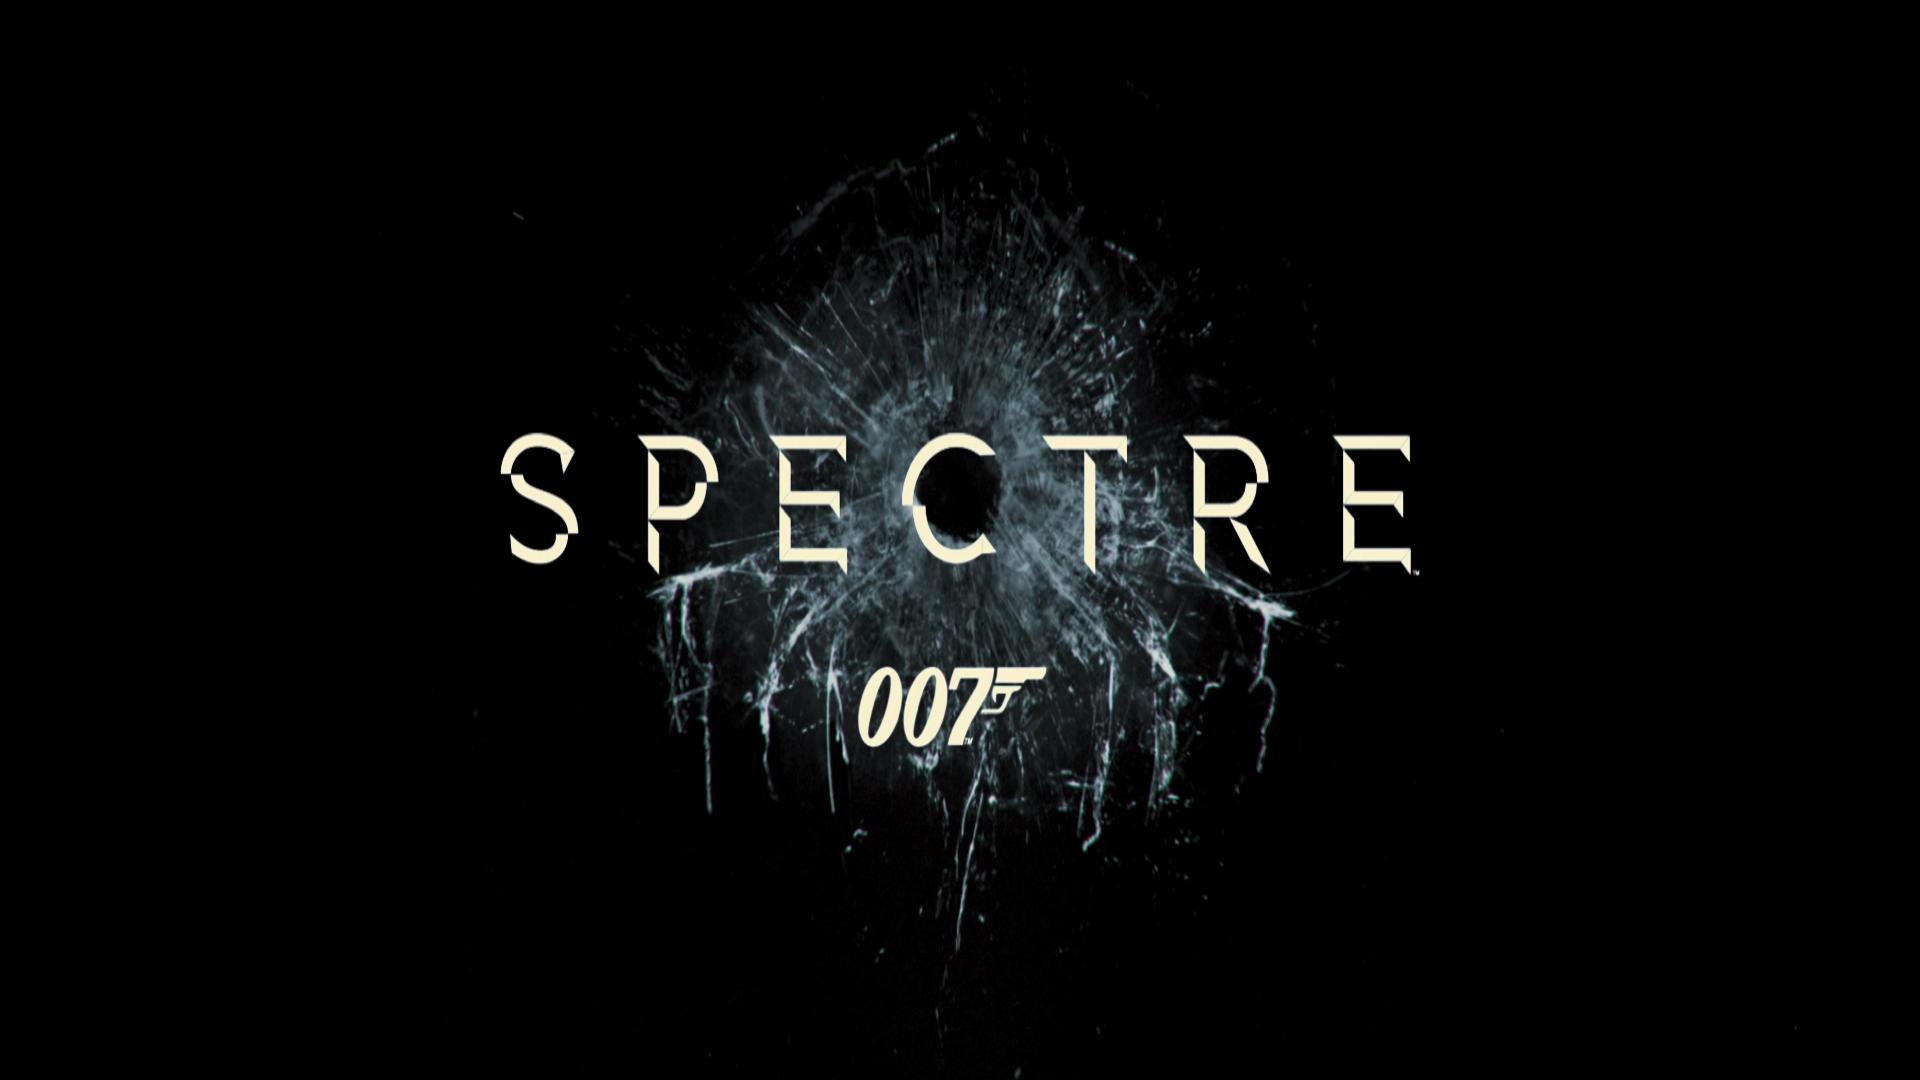 James Bond 007 Spectre James Bond James Bond 007 Spectre Wallpaper 1920x1080